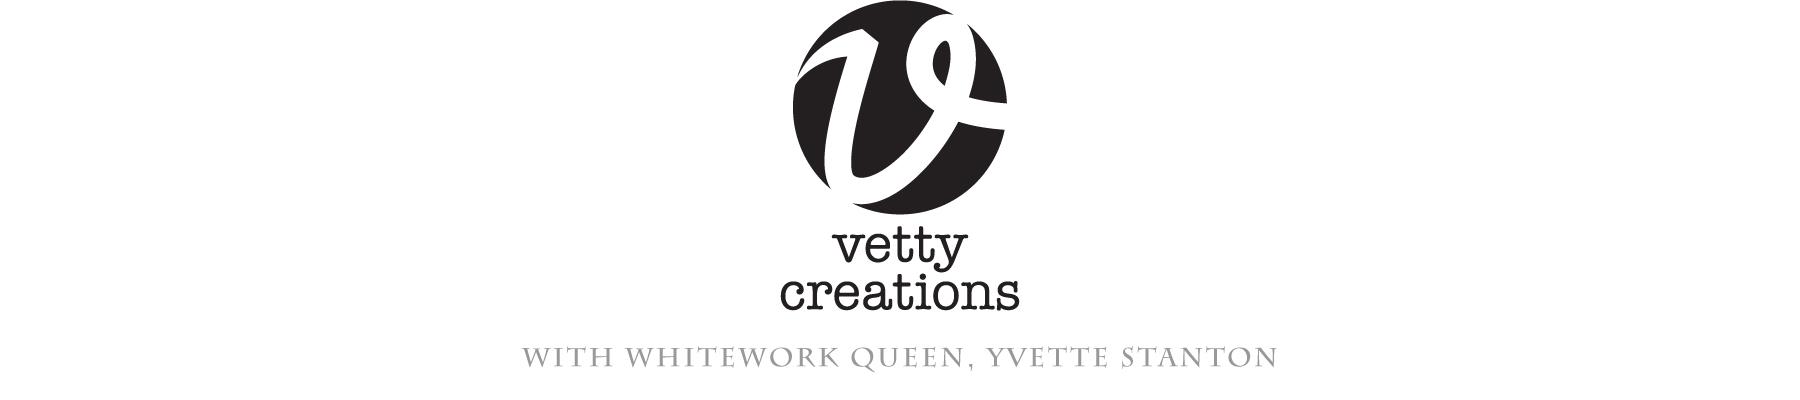 Vetty Creations header